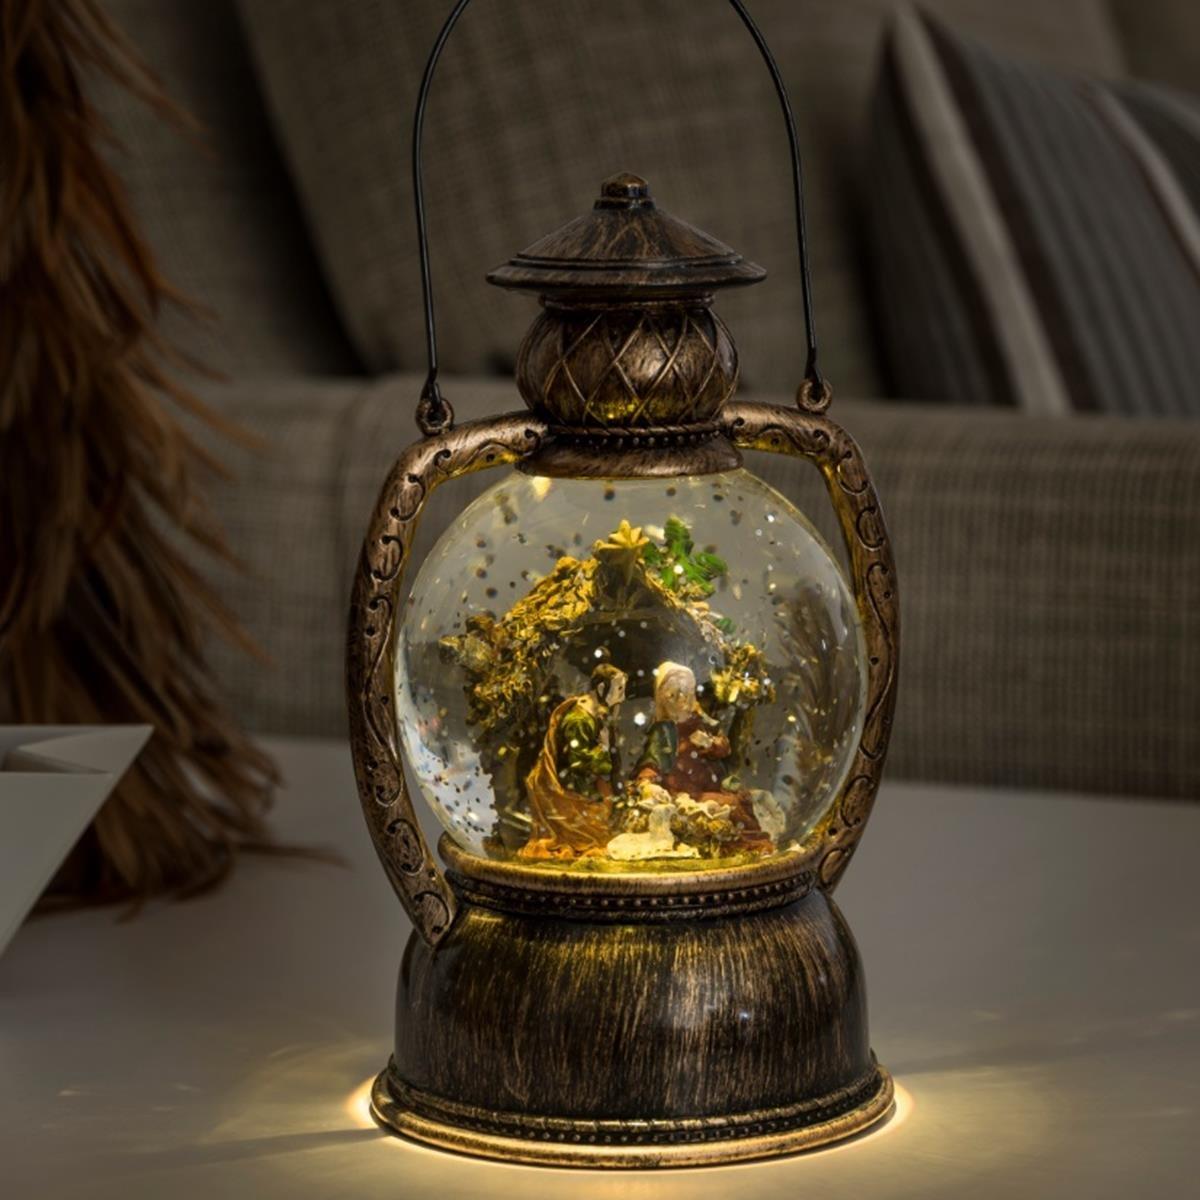 LED Christmas Lantern with Nativity Scene Water Globe Direct Global Trading